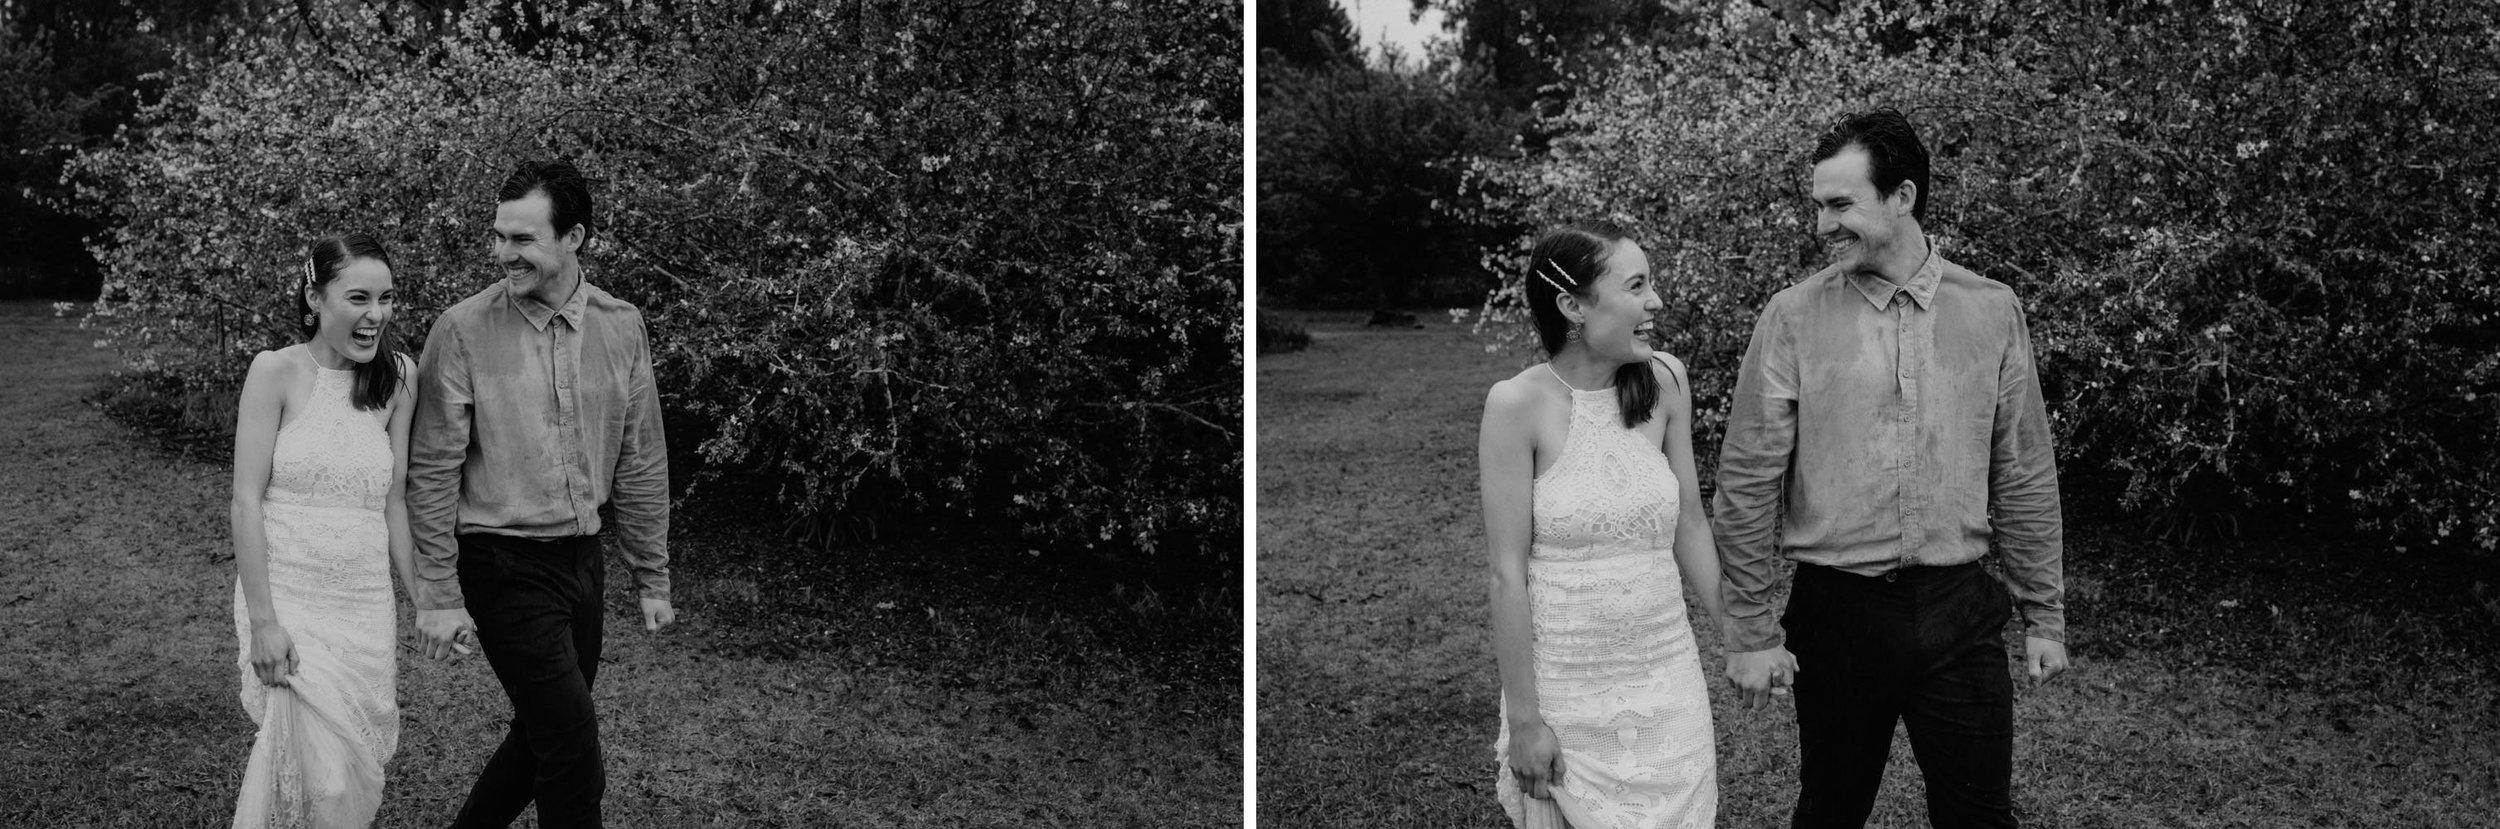 kangaroo-valley-wedding-photographer_112(4035) copy.jpg